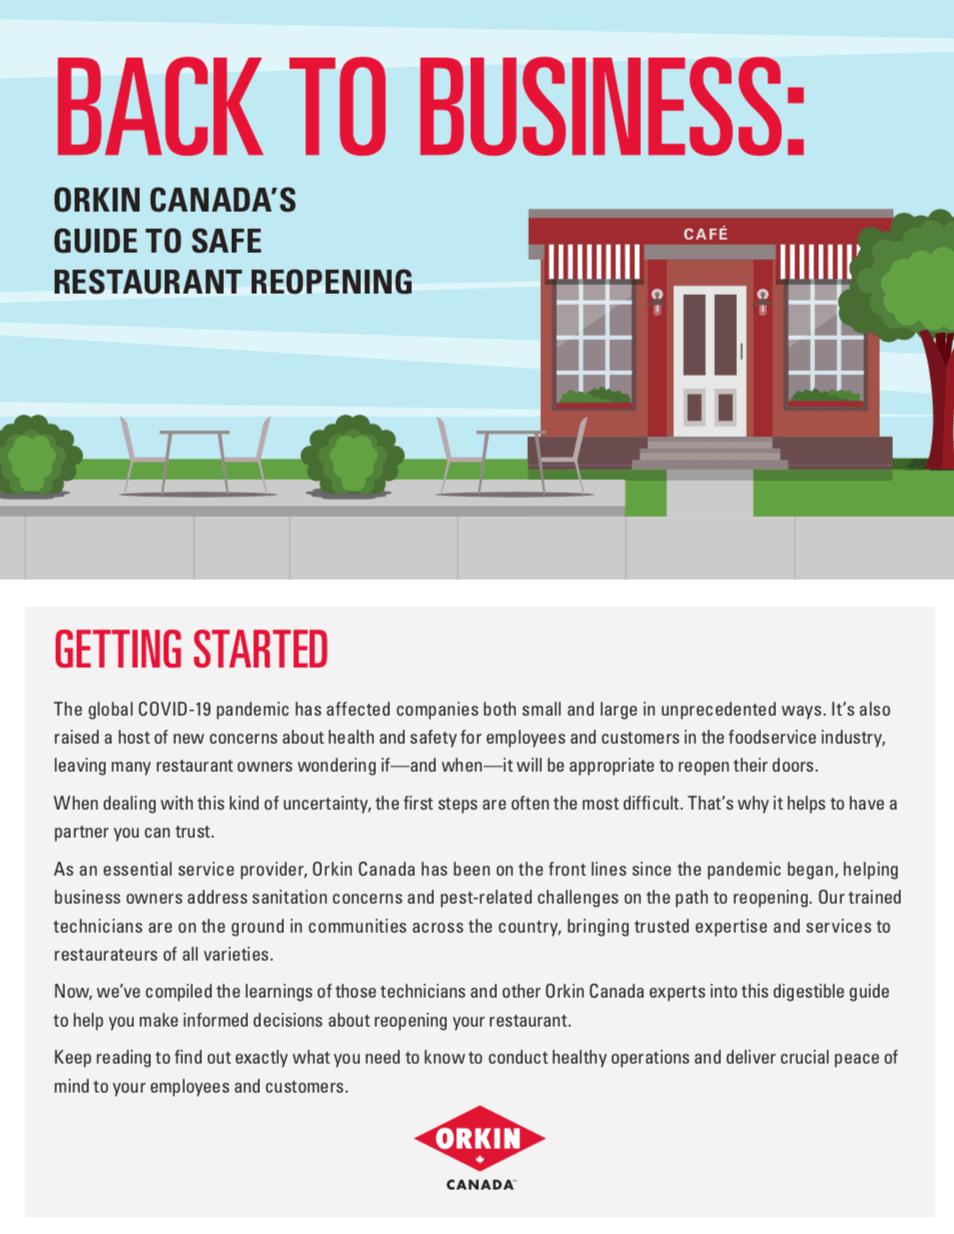 Orkin Guide for reopening restaurants